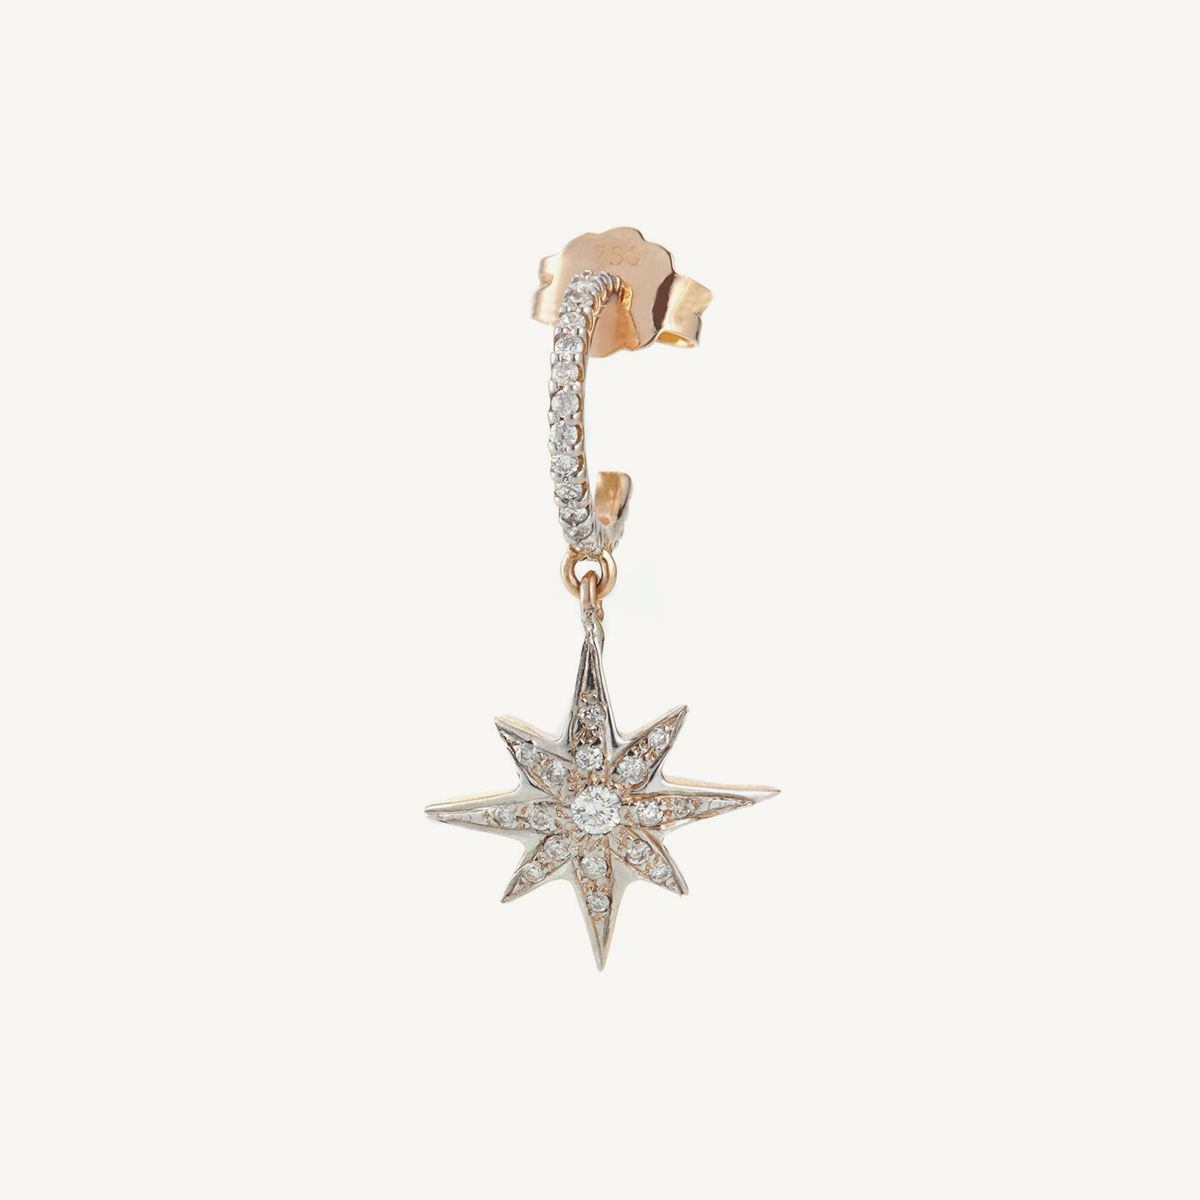 Earring Compass Star Mini Hoop